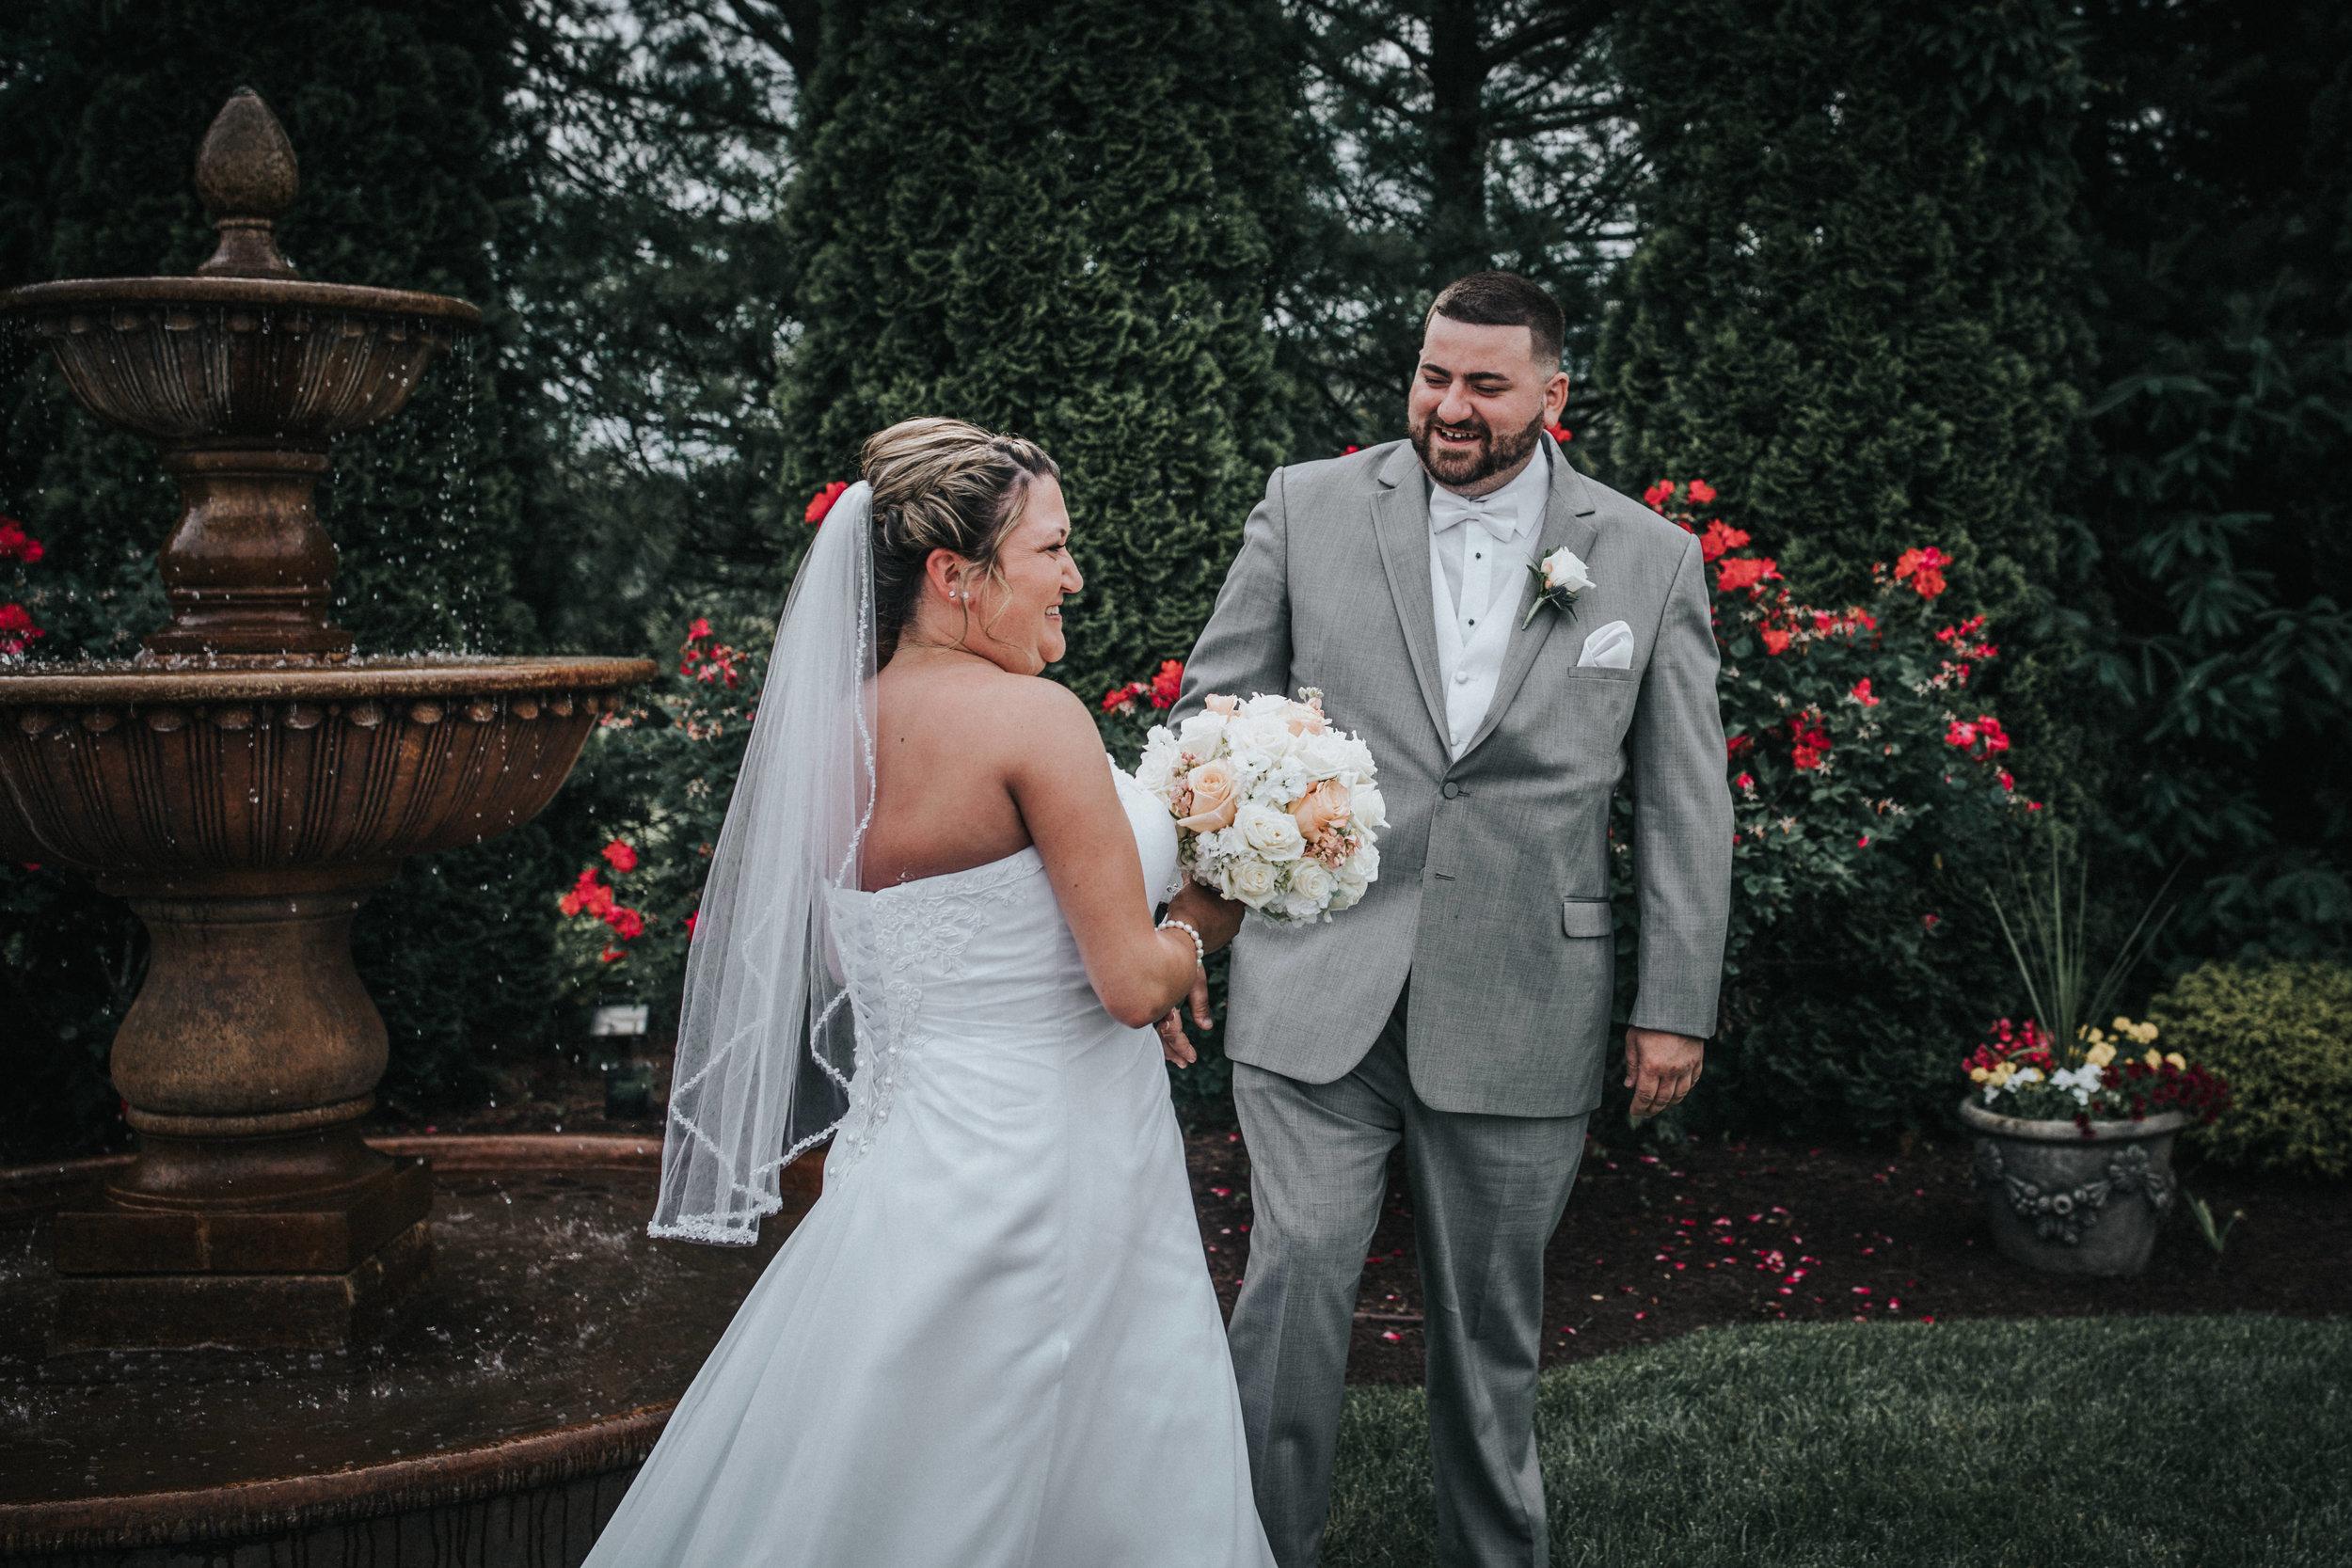 New-Jersey-Wedding-Photographer-JennaLynnPhotography-ValenzanoWinery-FirstLook-11.jpg